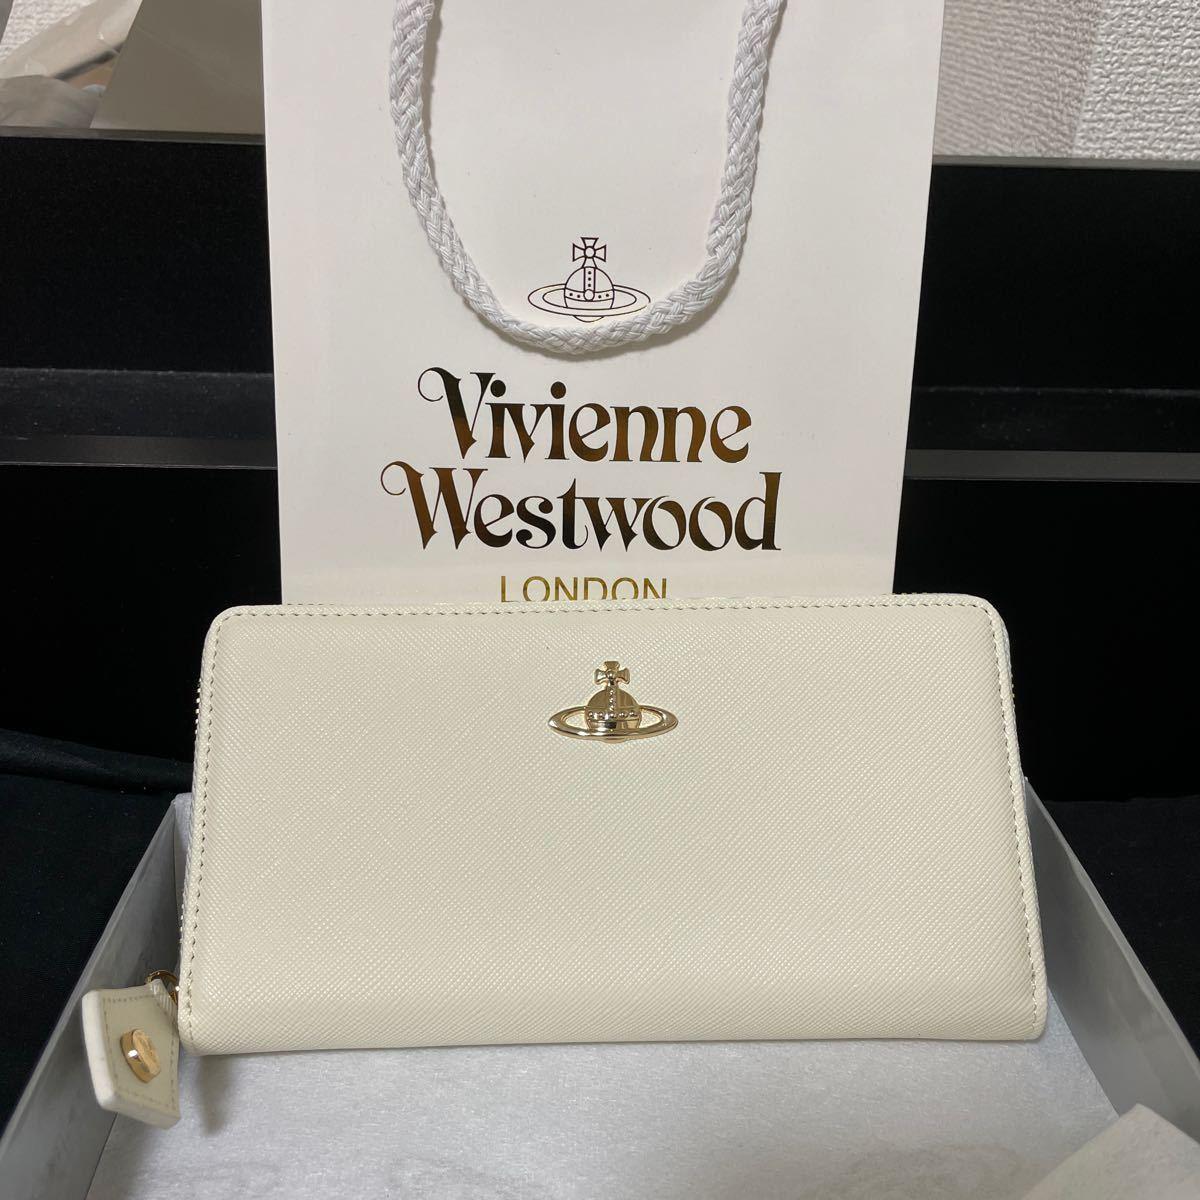 Vivienne Westwood 長財布 ホワイトラウンドファスナー ヴィヴィアンウエストウッド 純正箱付き